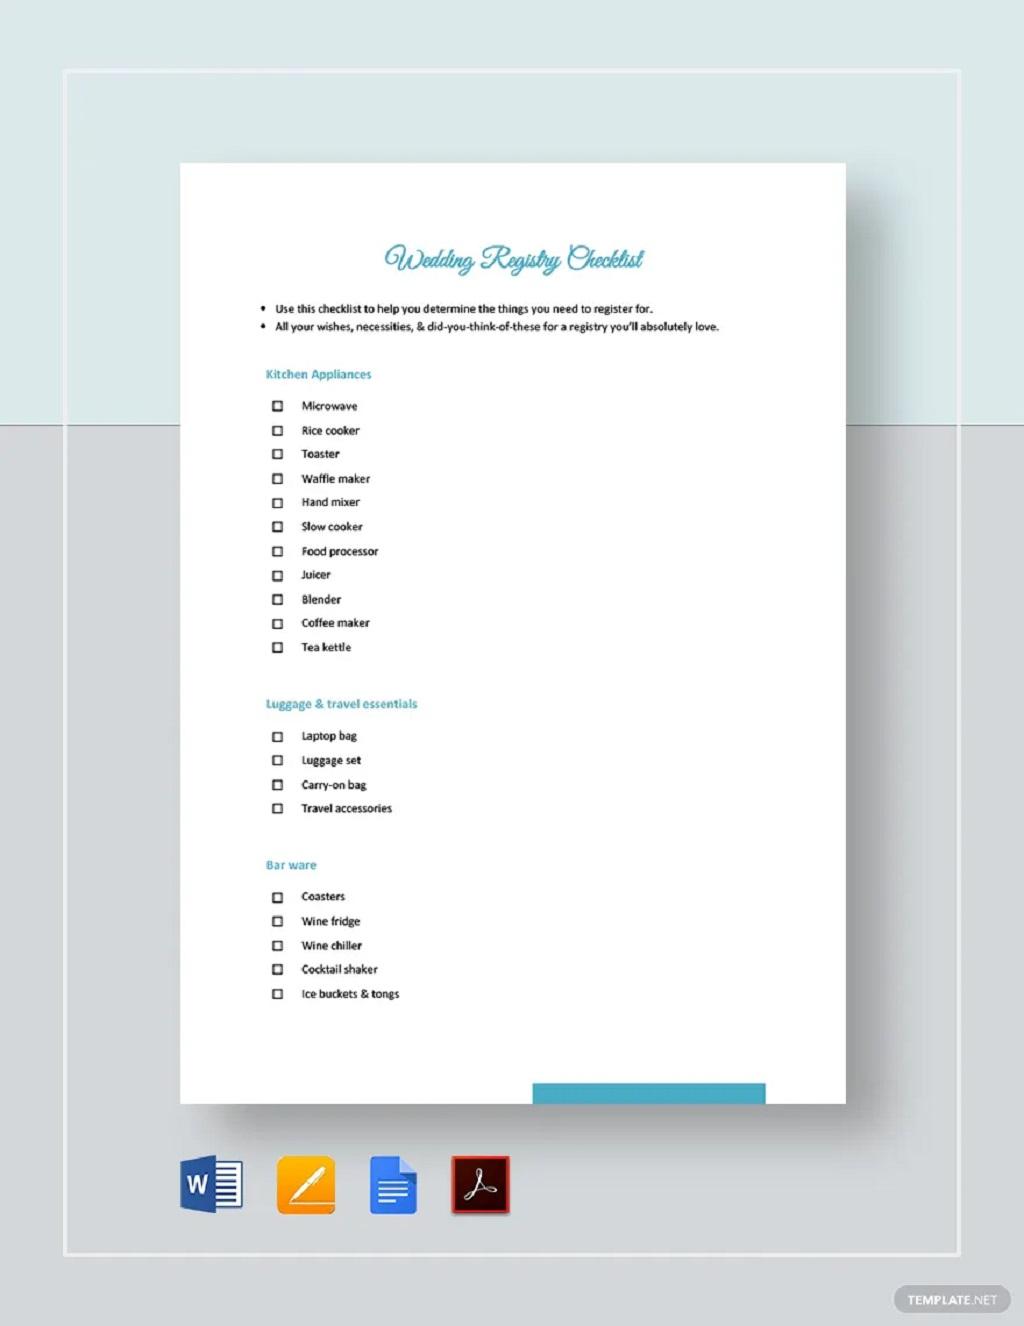 Wedding Registry Checklist Template Format Sample Example